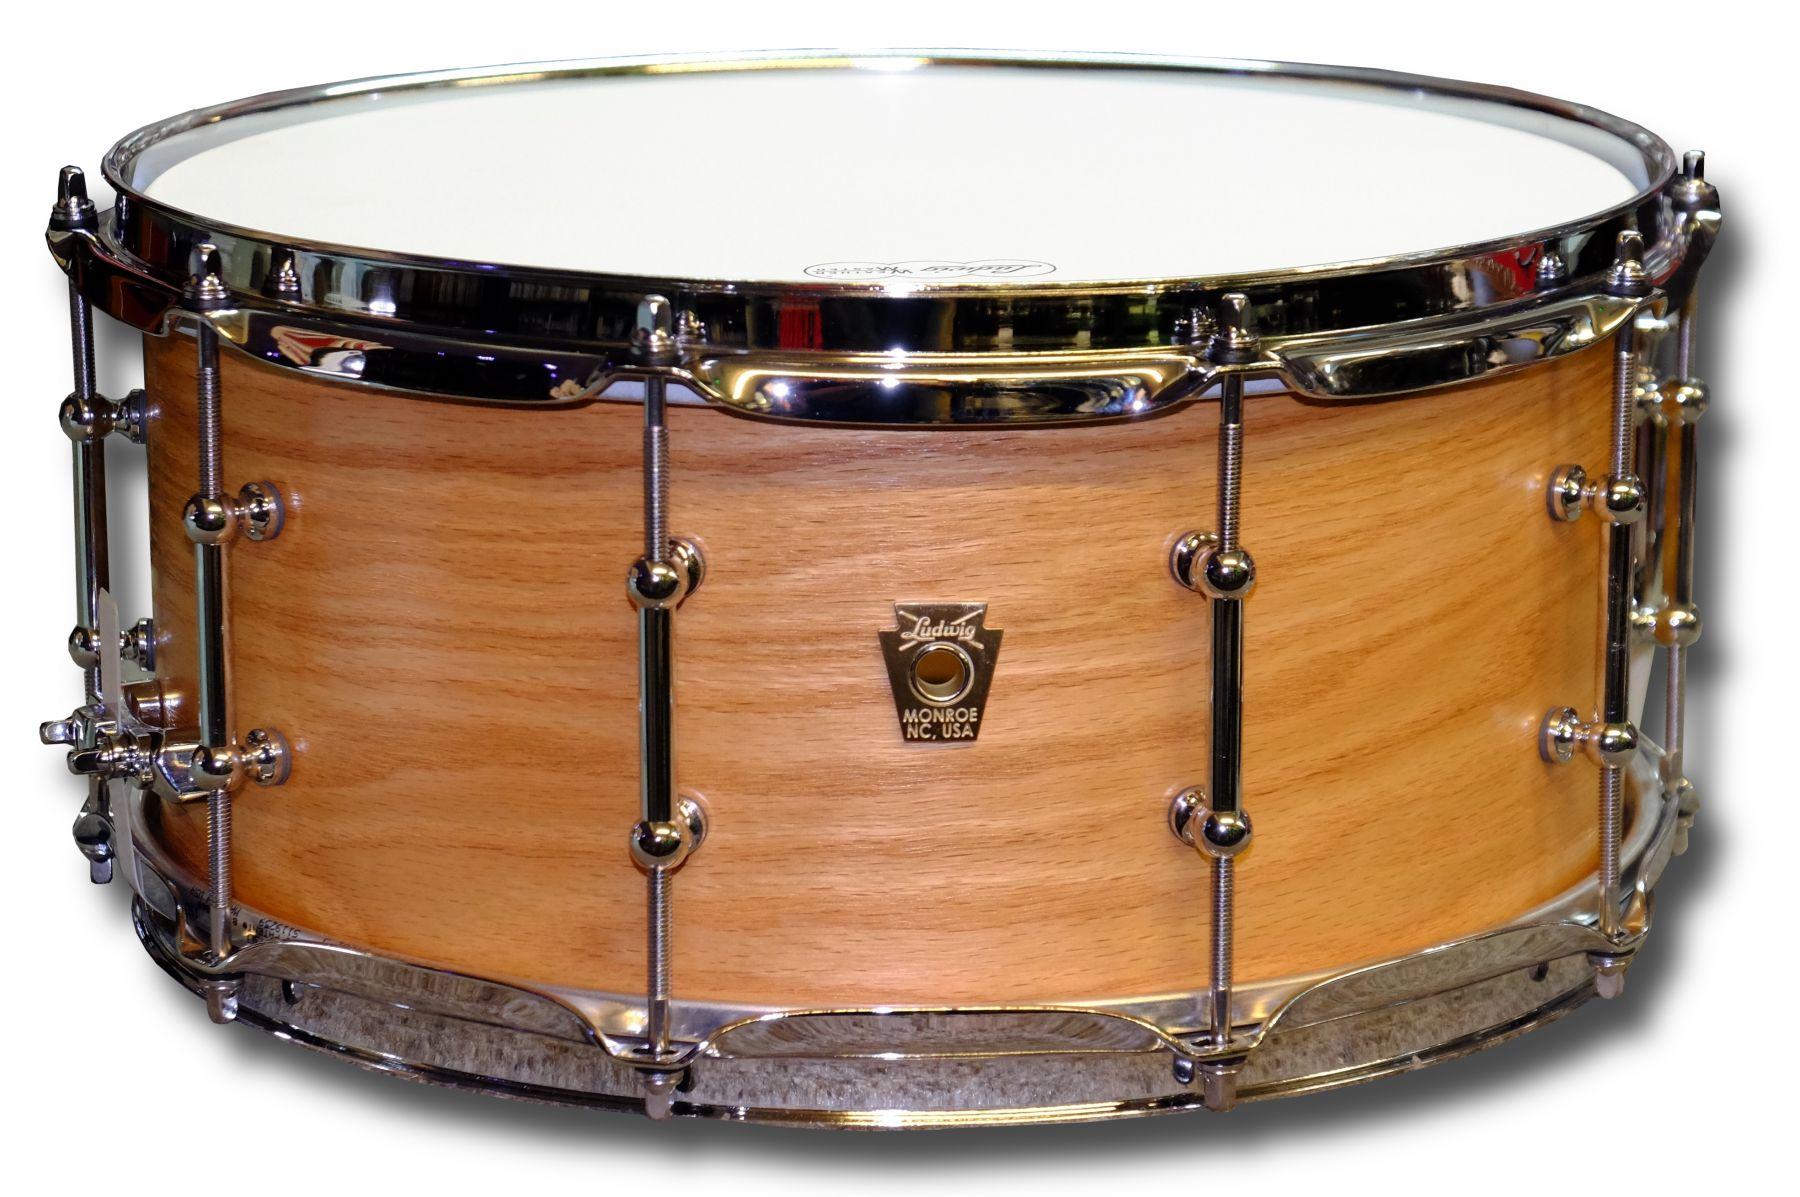 Hair 3 Popular Design Ideas For Modern ludwig Drums